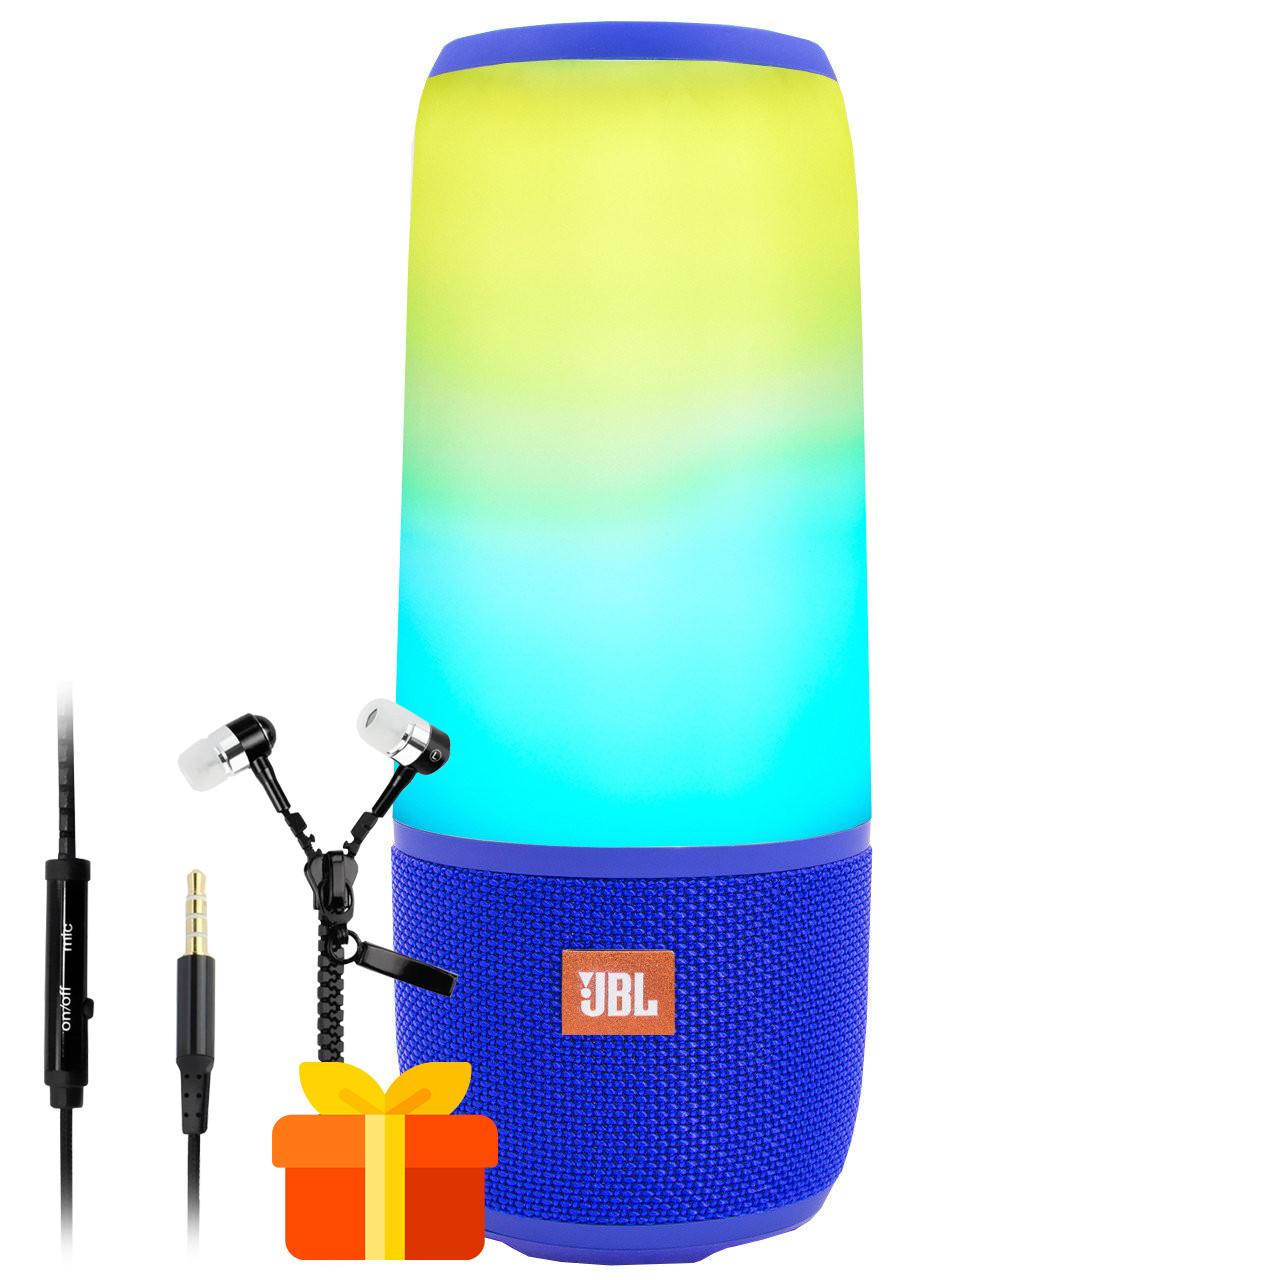 ★Беспроводная колонка BL JBL Pulse Р3 Blue портативная светоэффекты AUX USB micro SD micro USB Стерео